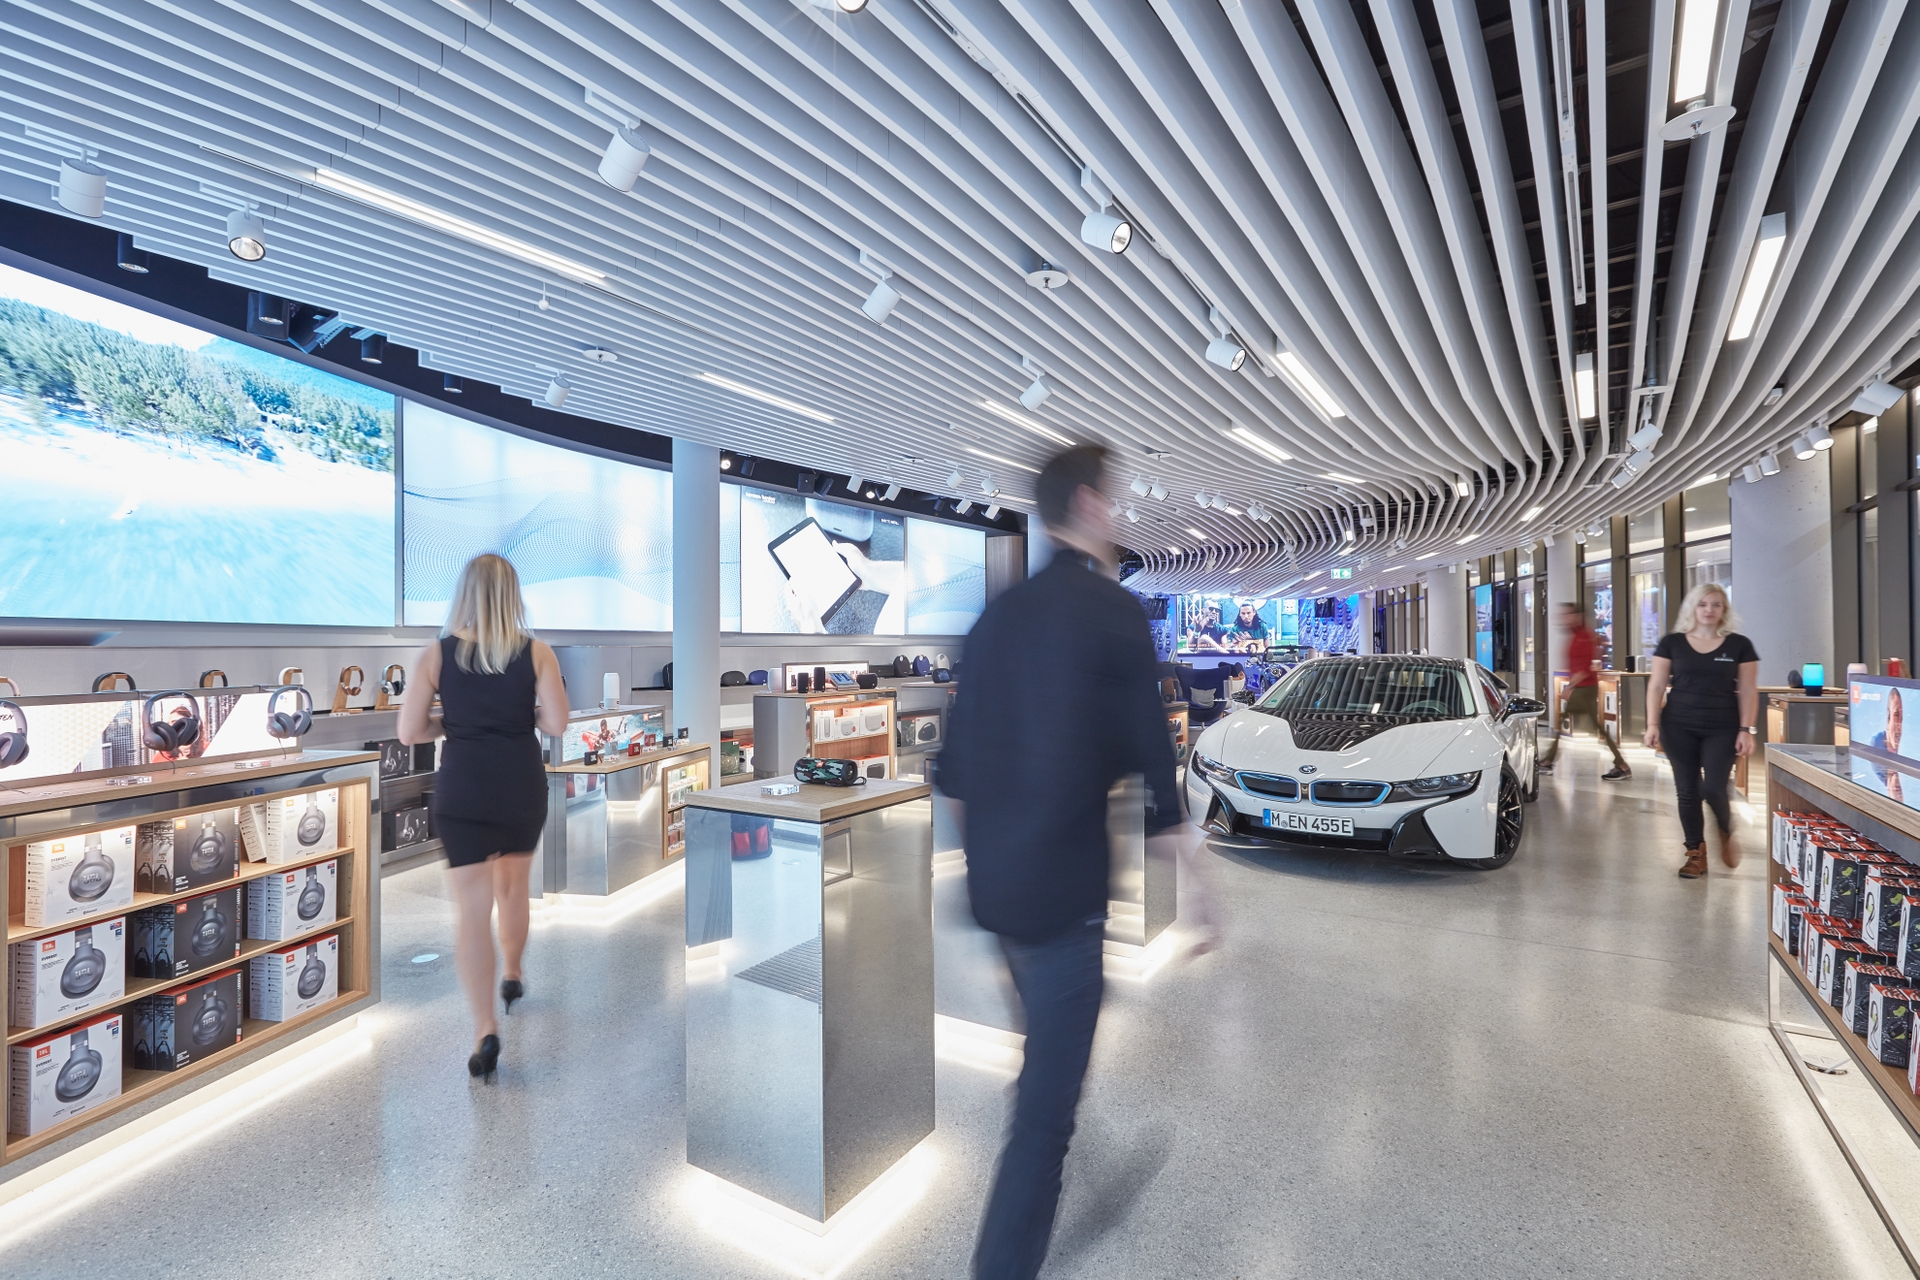 HARMAN Store_BMW i8_people blurred_3277